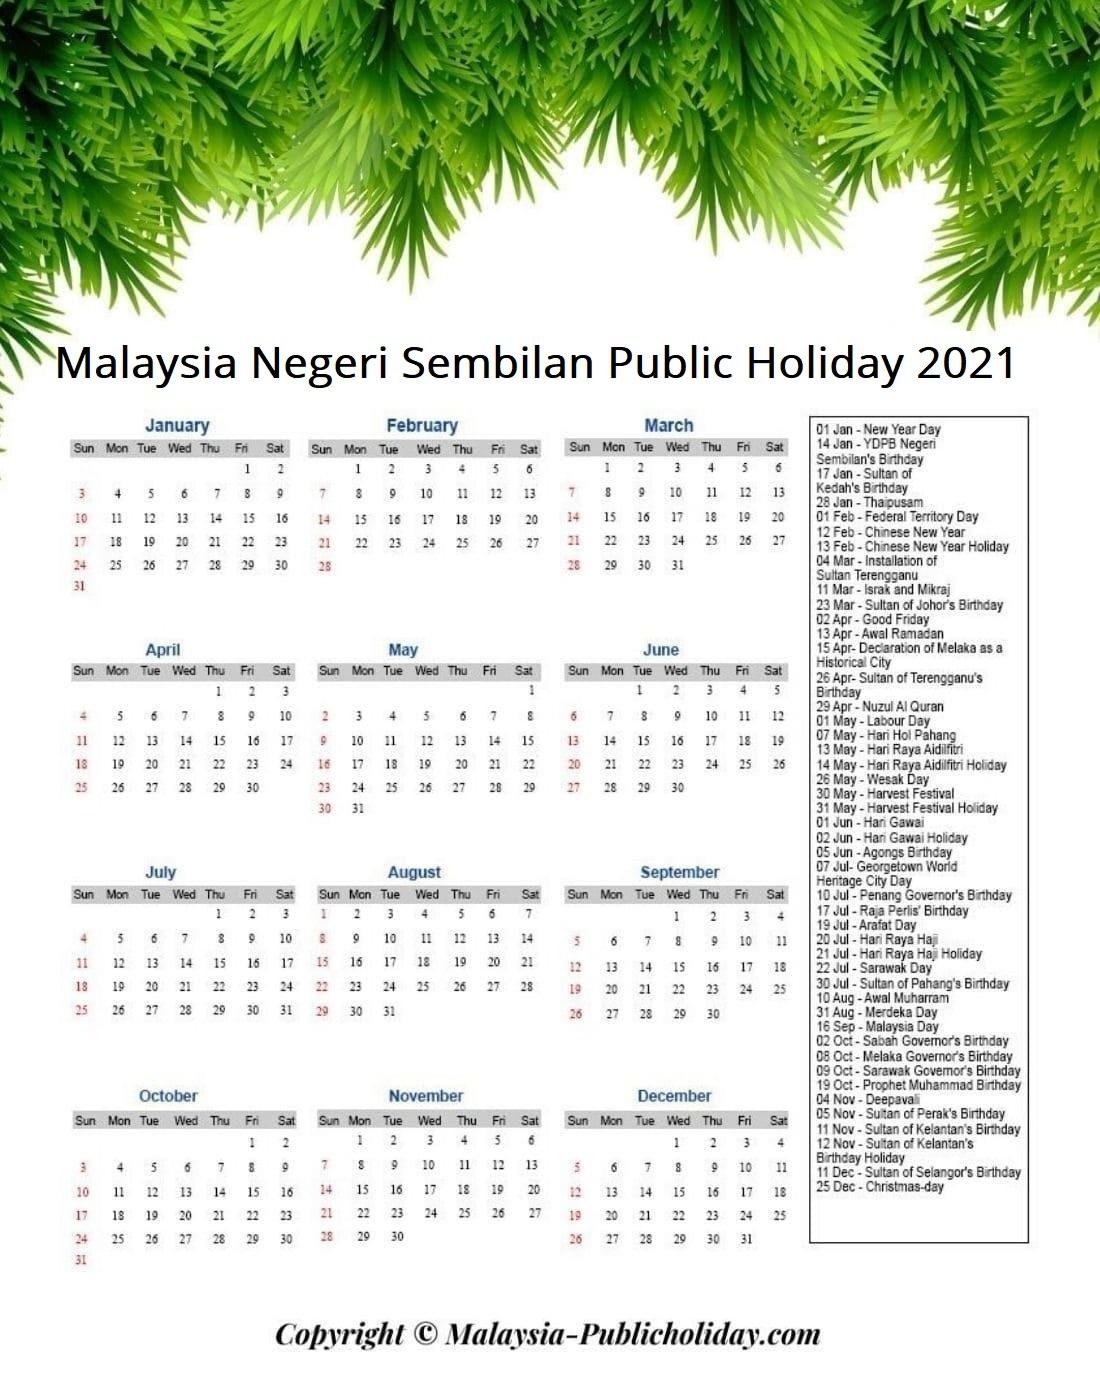 Negeri Sembilan Holiday 2021 Malaysia